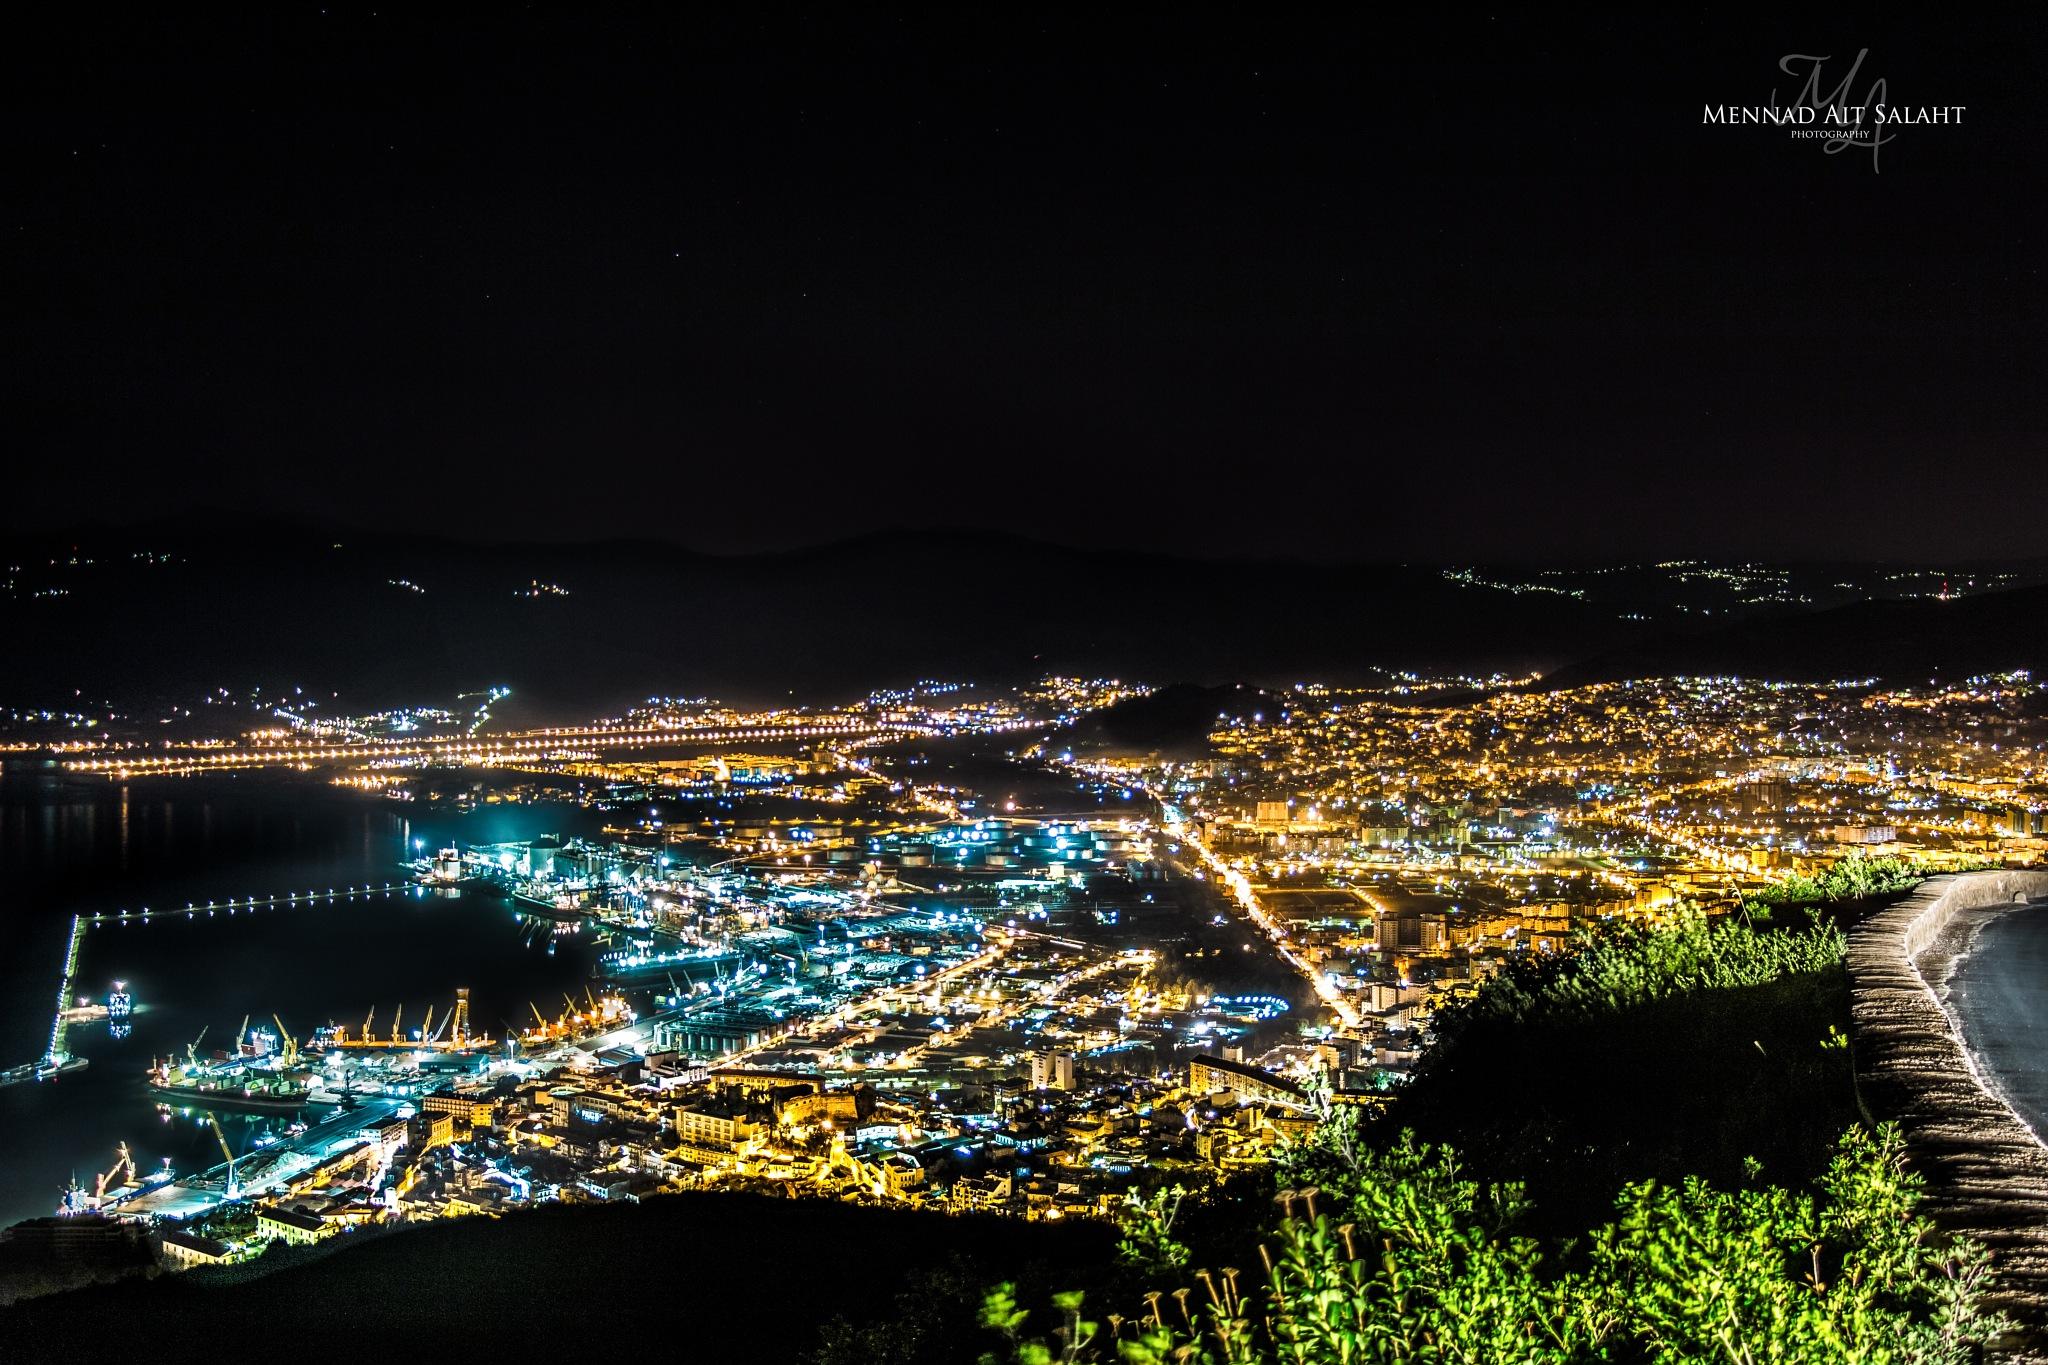 Bejaia By Night (Algeria) by Mennad AIT SALAHT